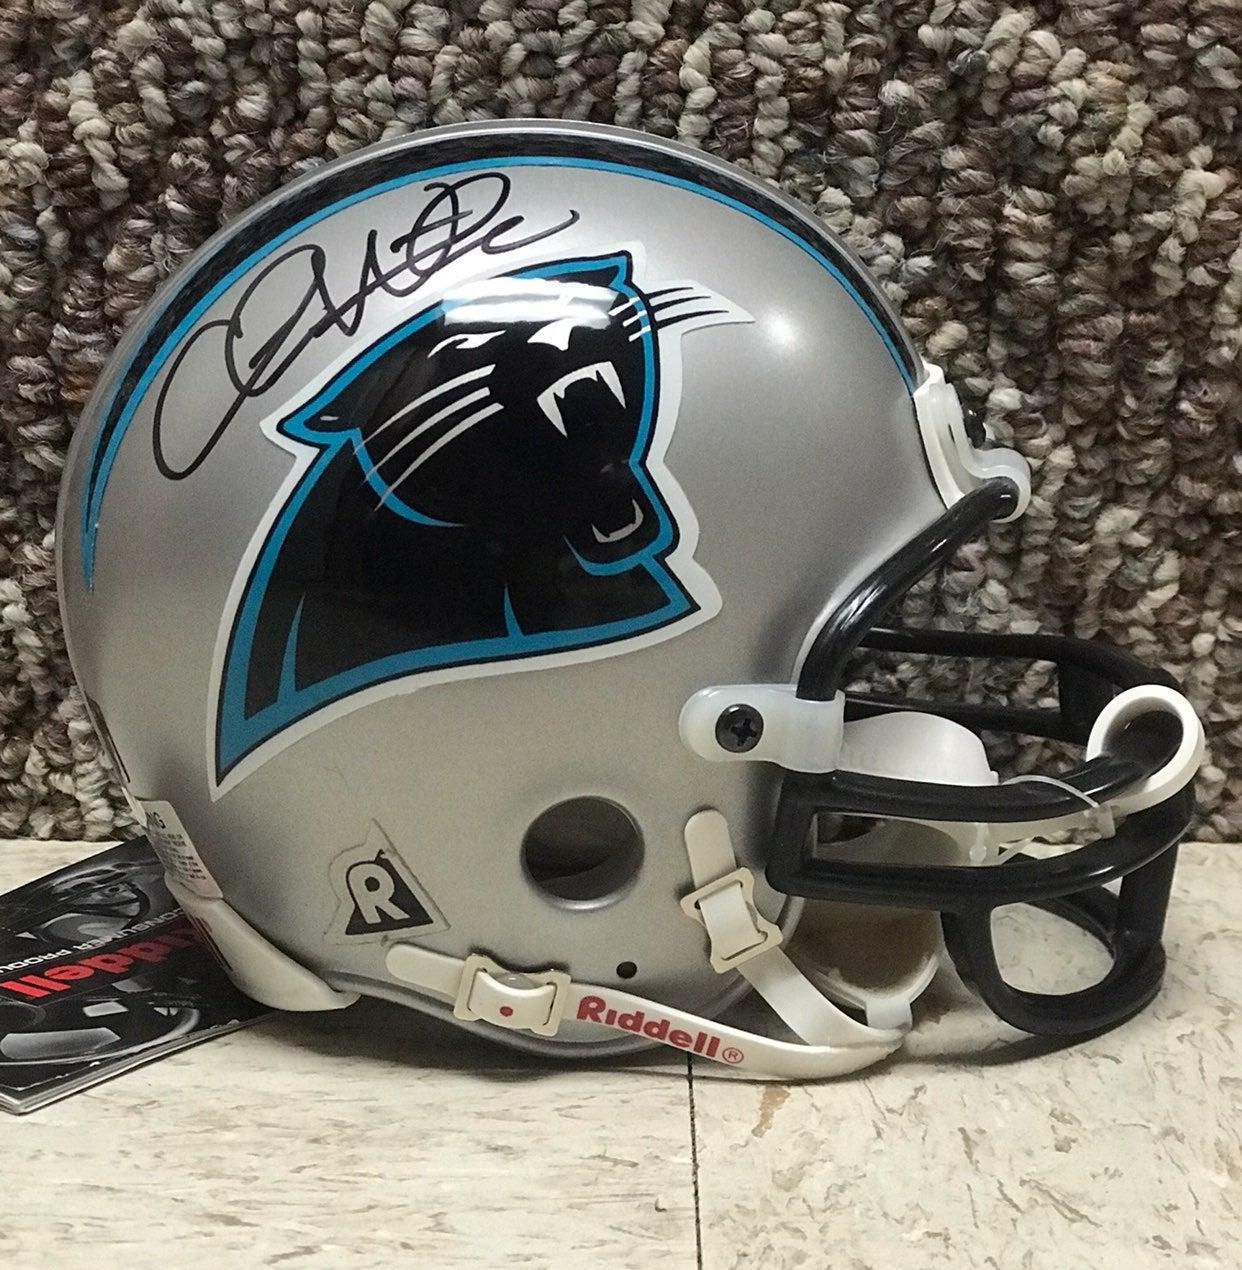 Carolina Panthers Chris Weinke Helmet